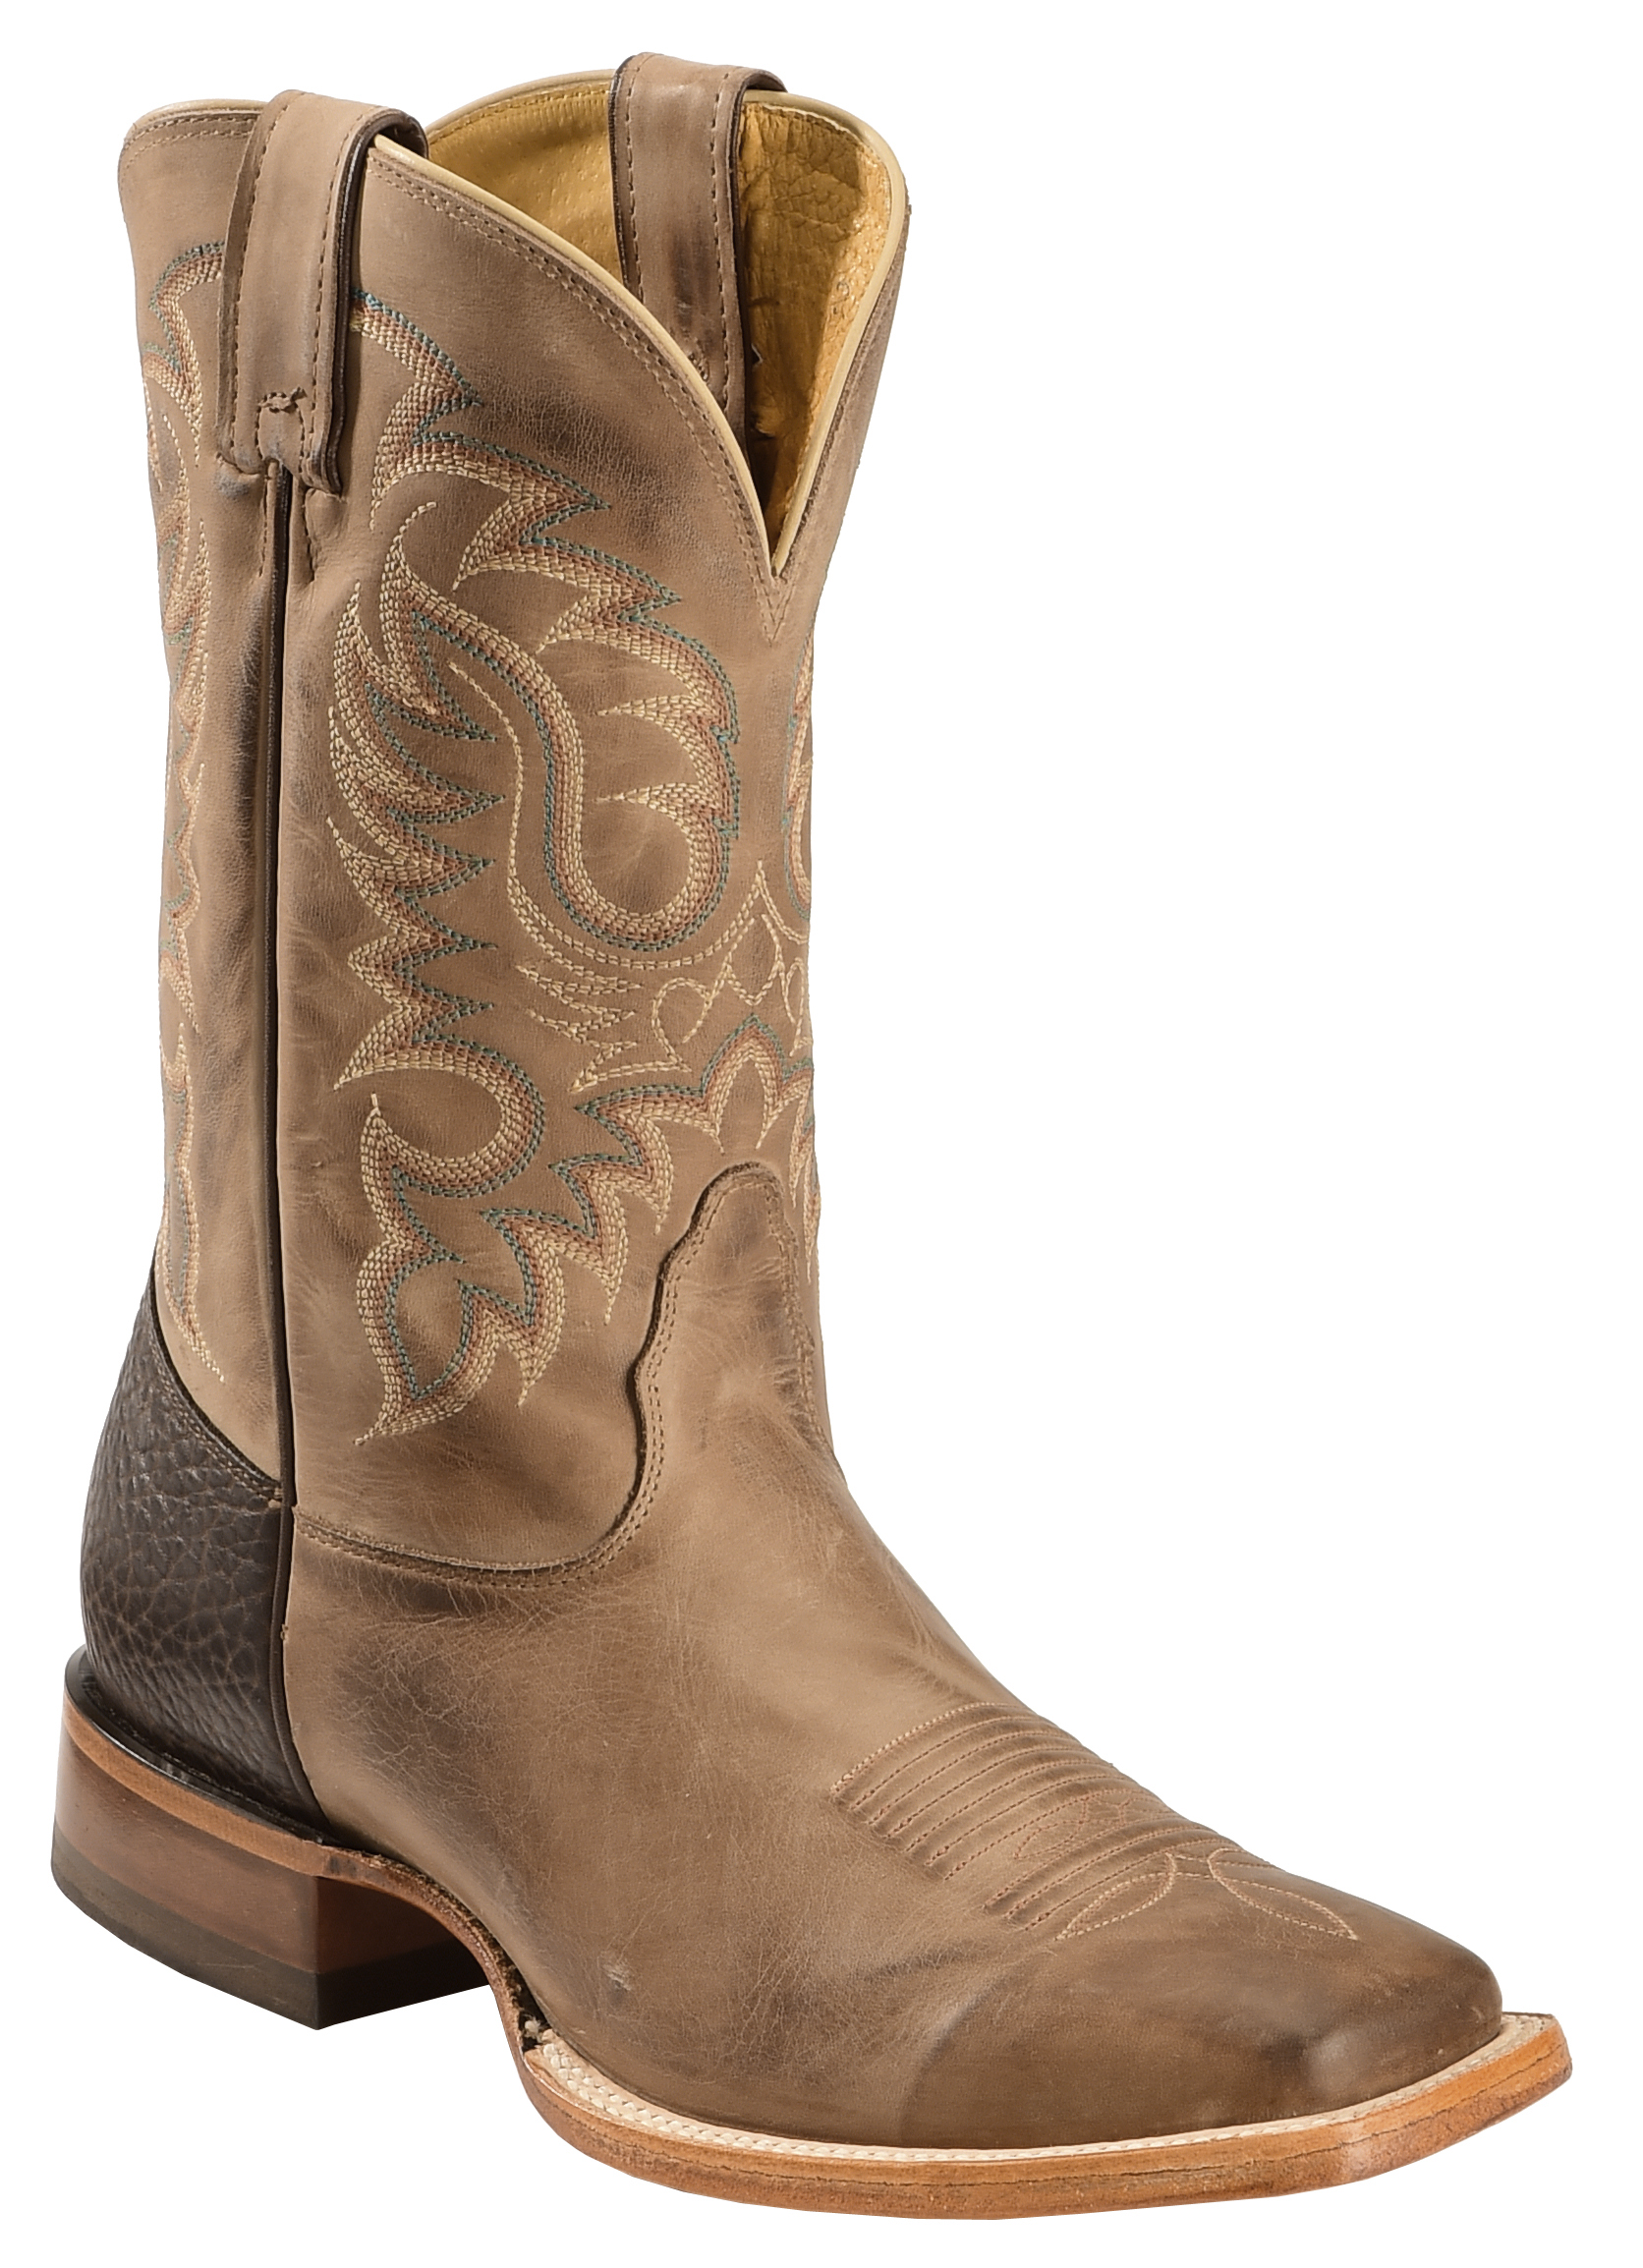 Nocona Legacy Series Vintage Cowboy Boot Sheplers